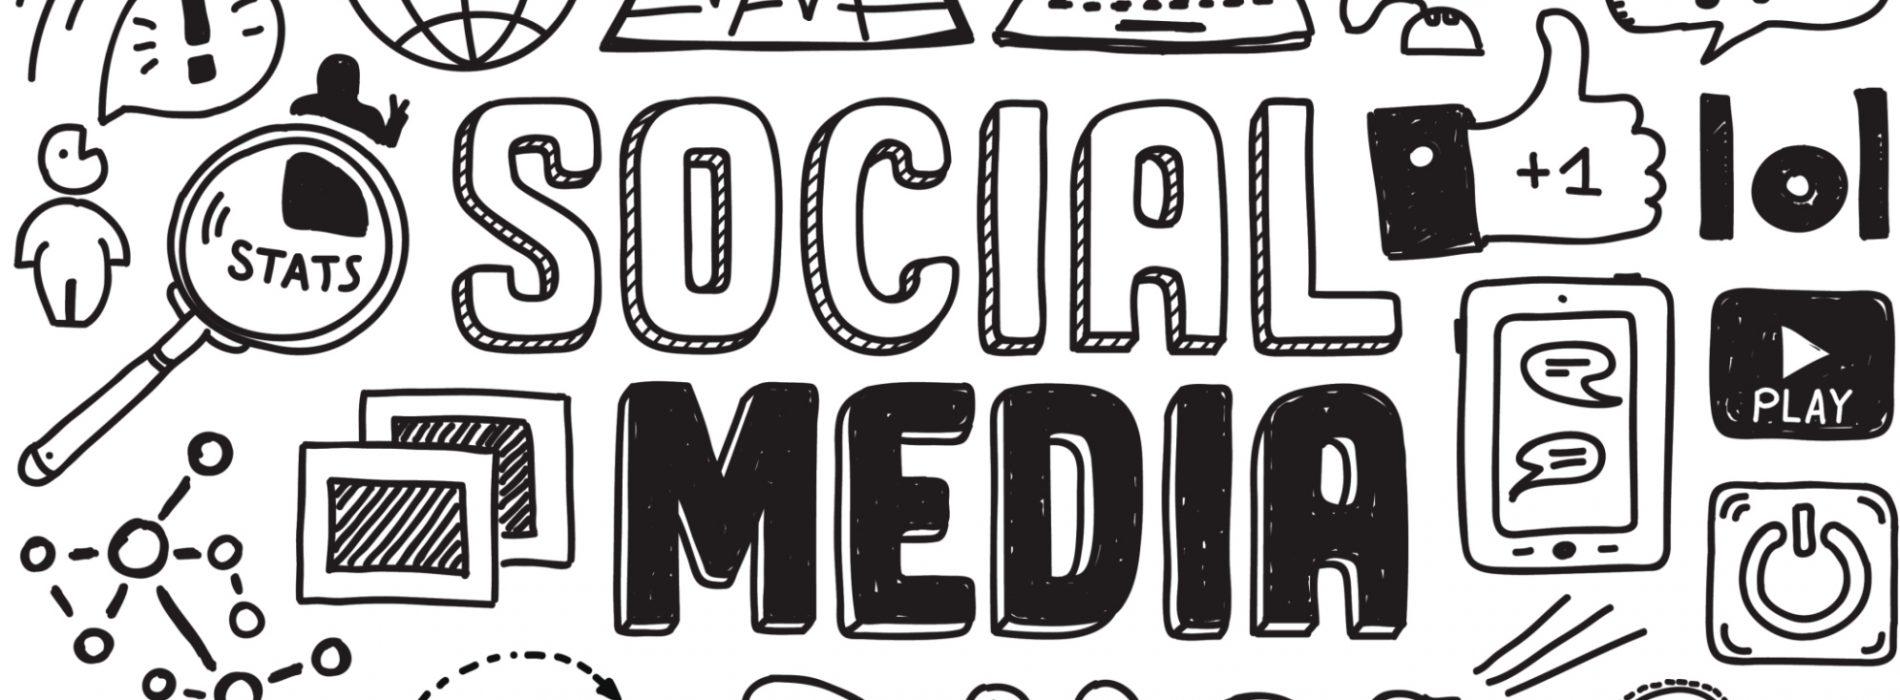 Social Media Usage Preferences Survey